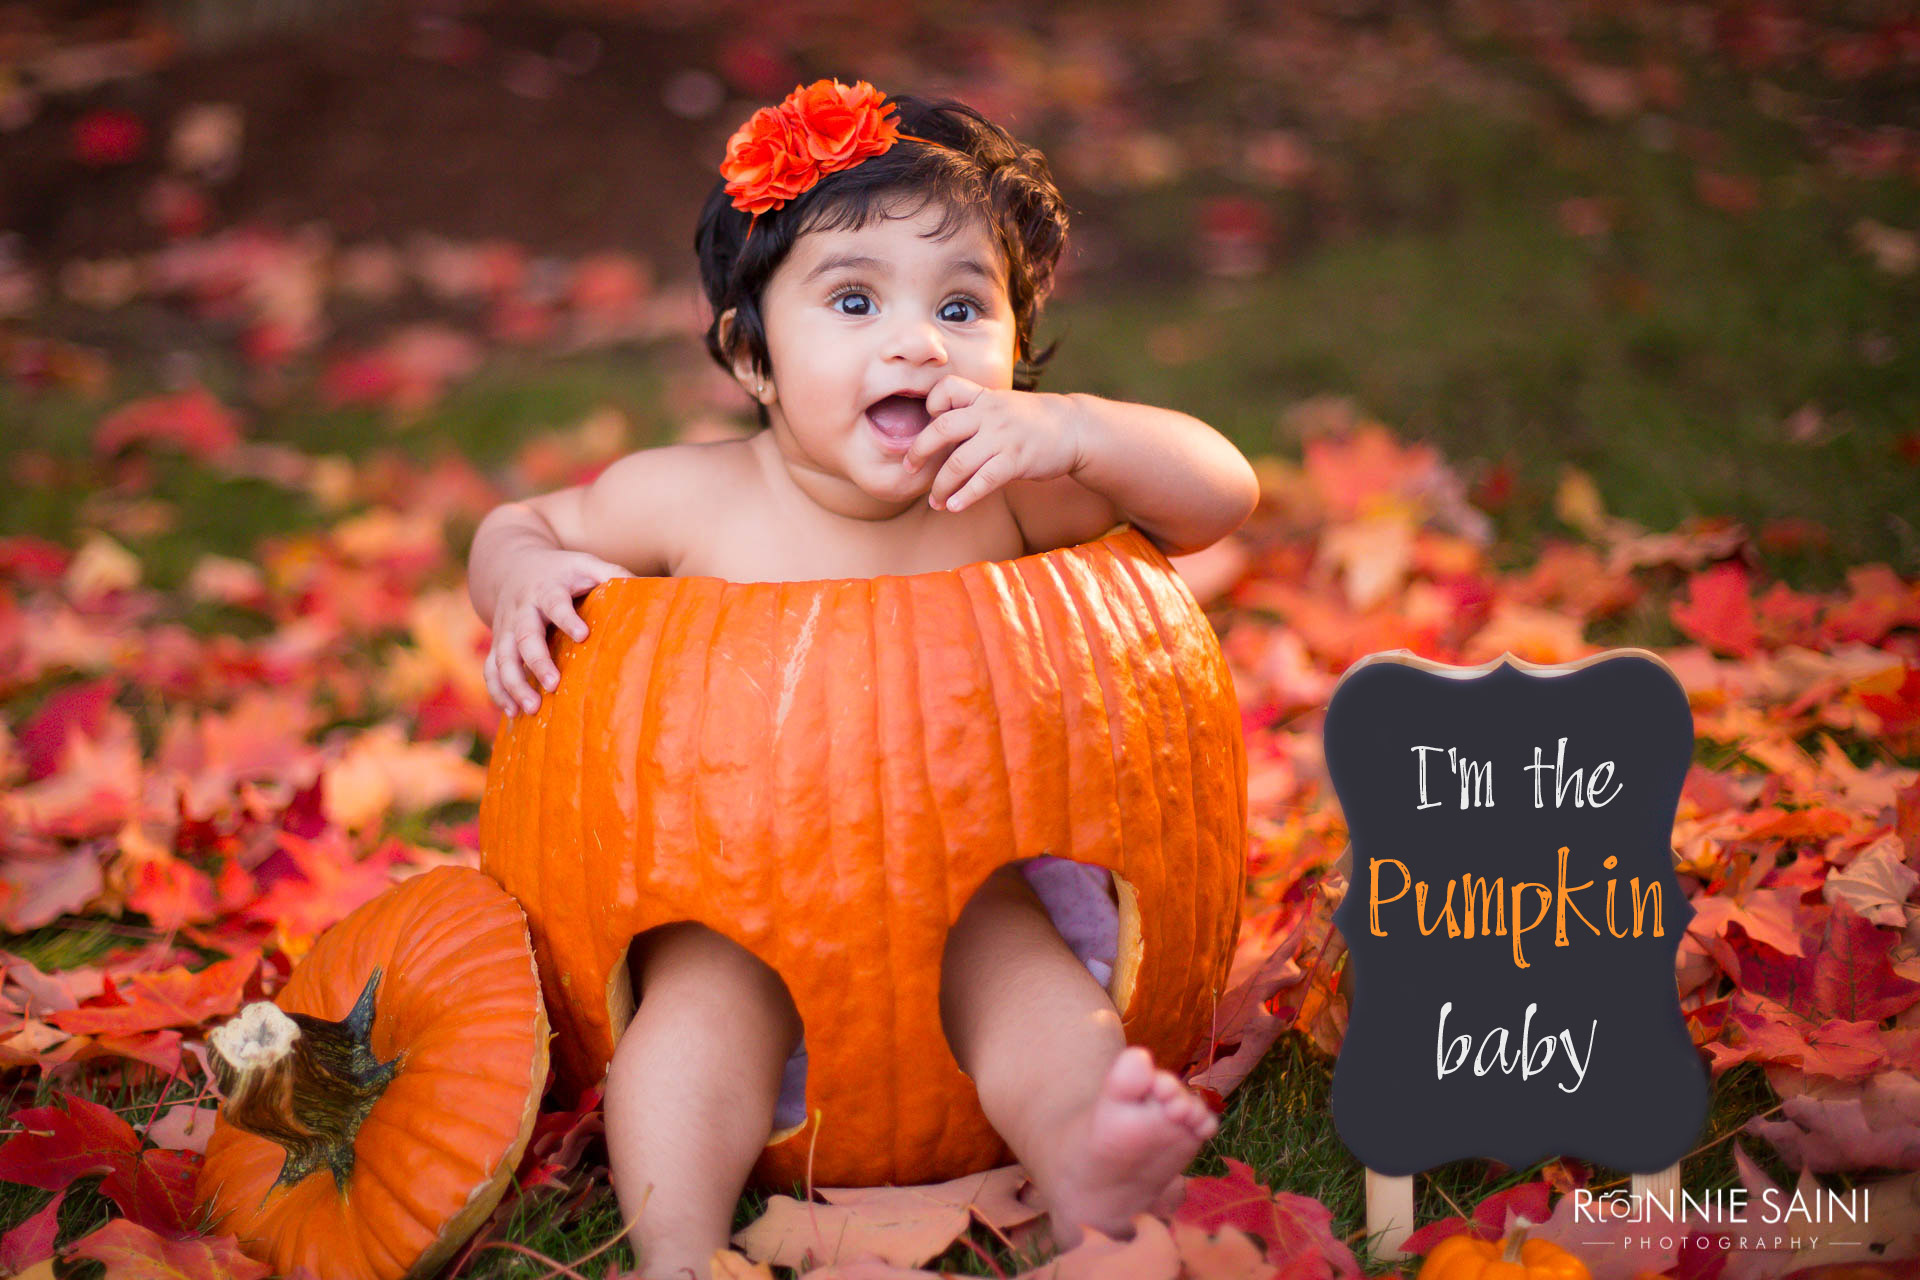 Baby in a pumpkin fall portrait session boston ronnie saini